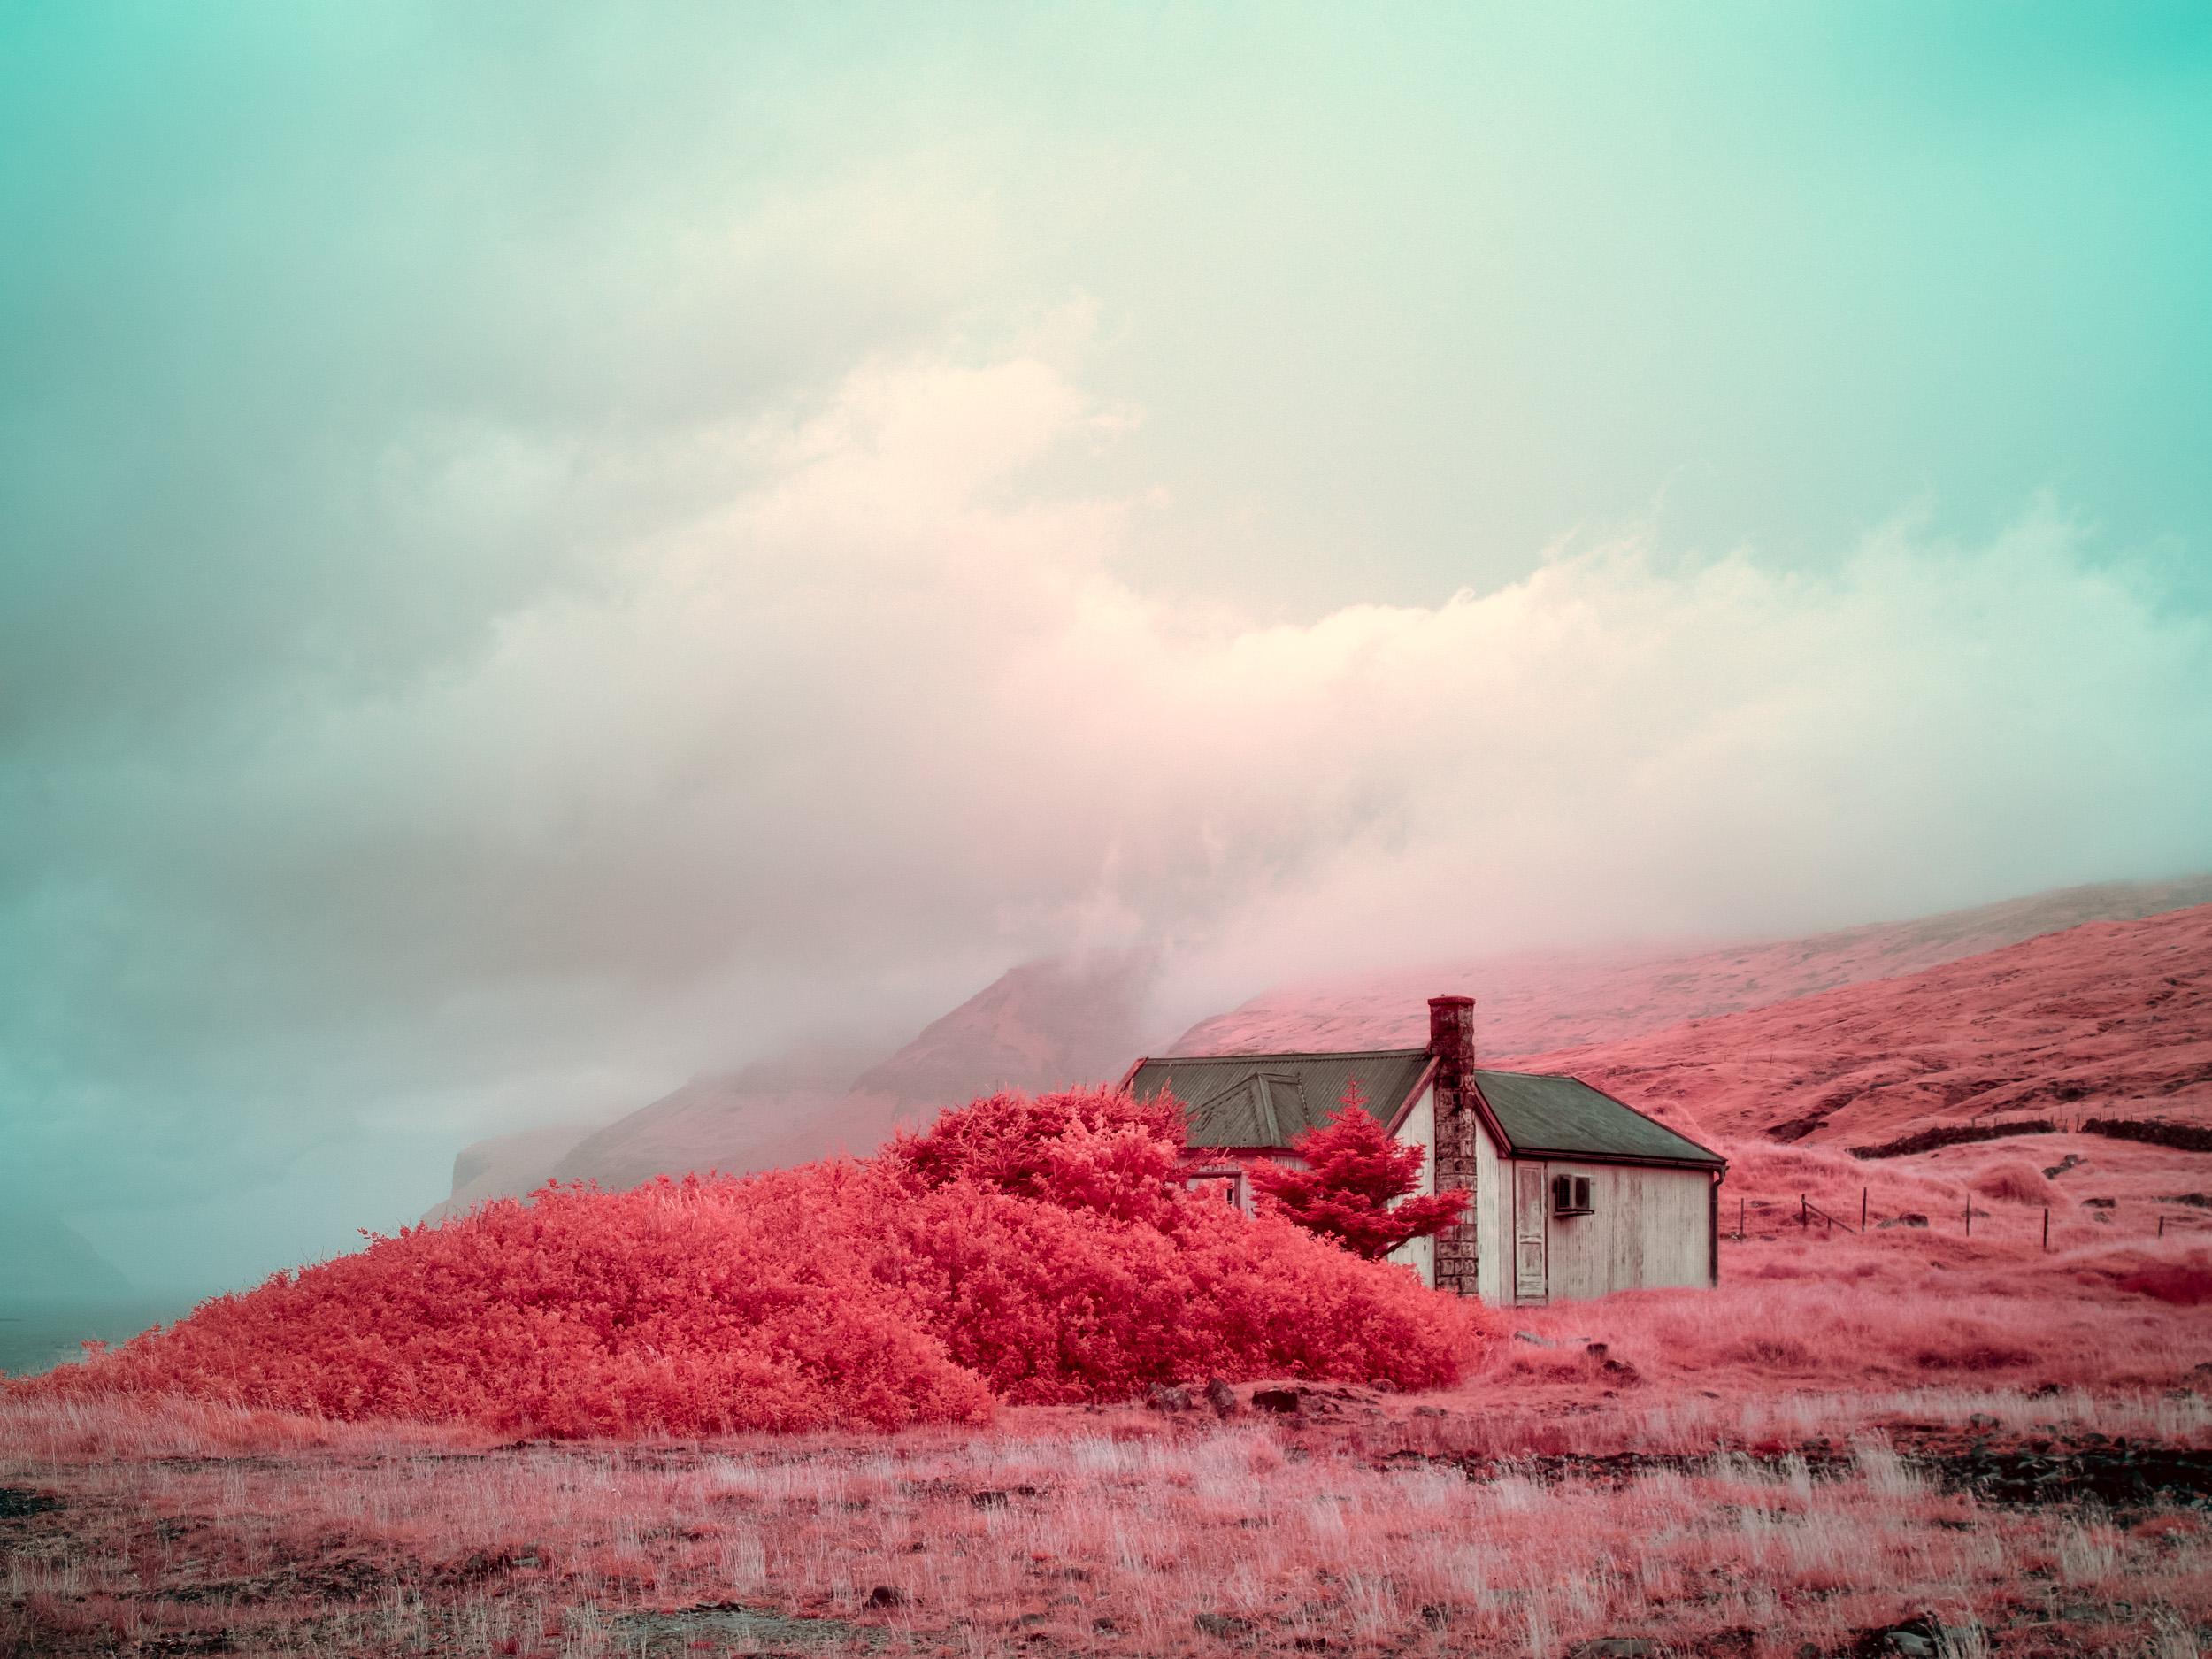 © Gabrielle Motola